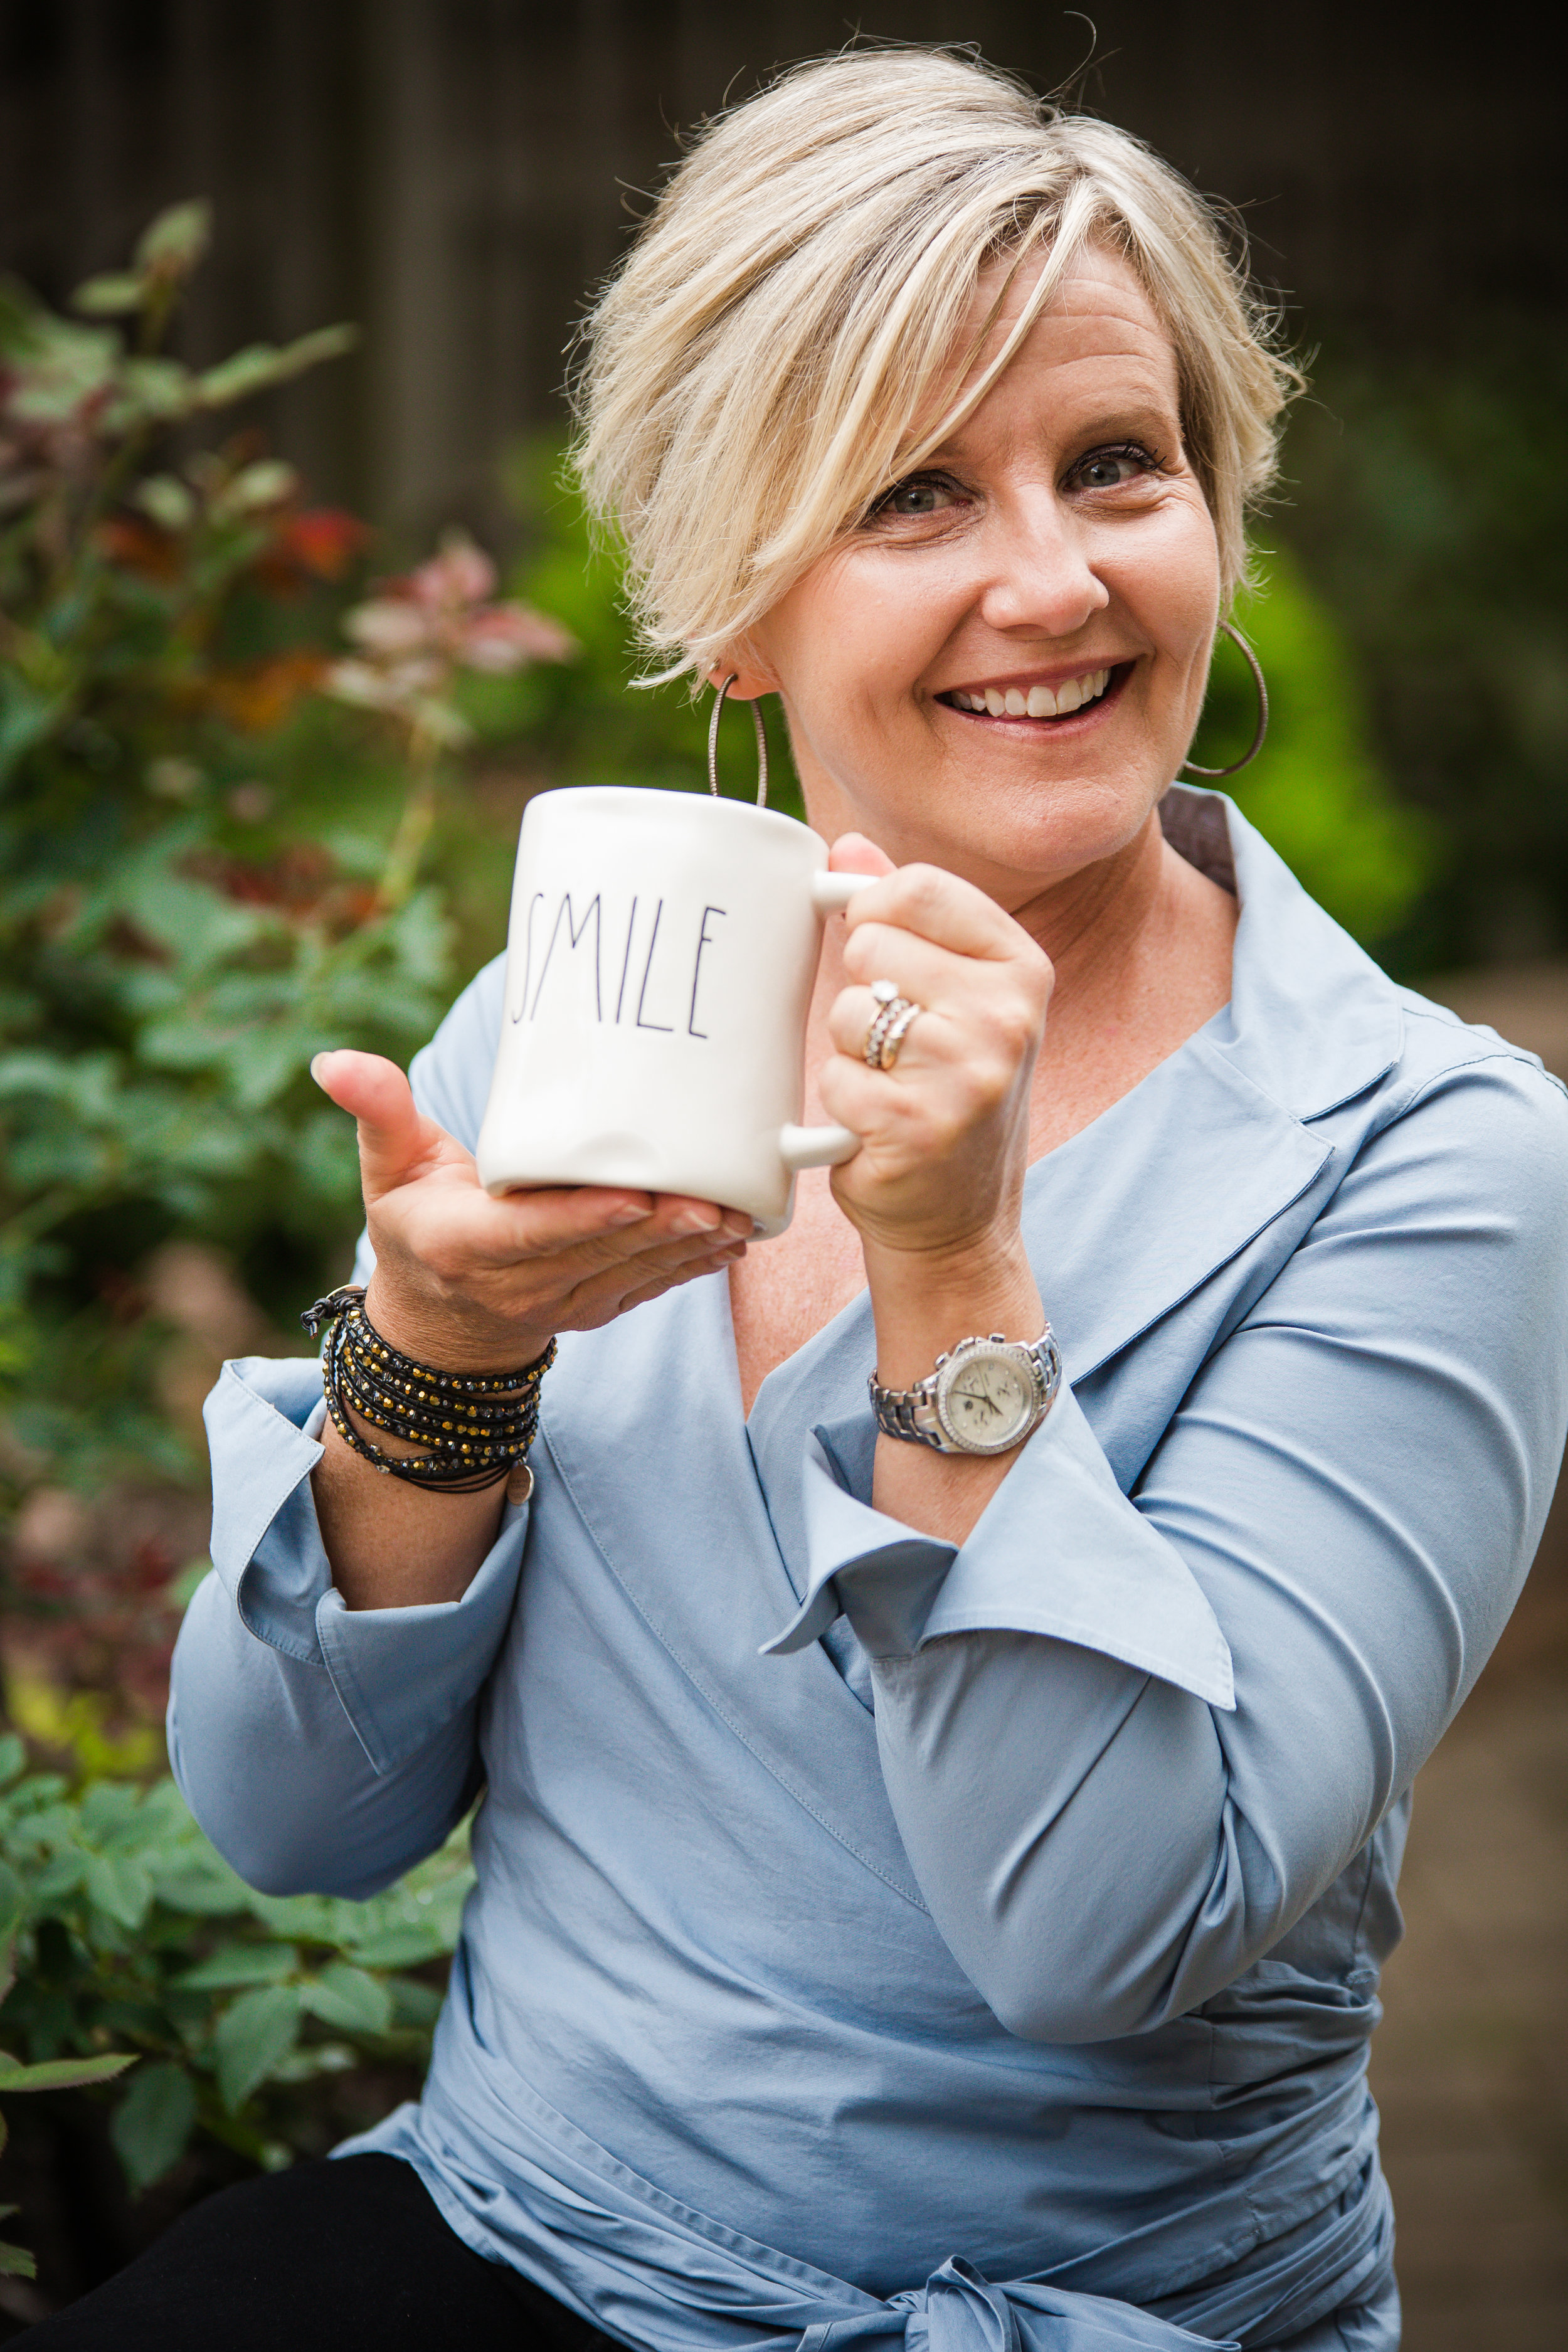 branding photography burlington new jersey holistic life coach pictures smile mug